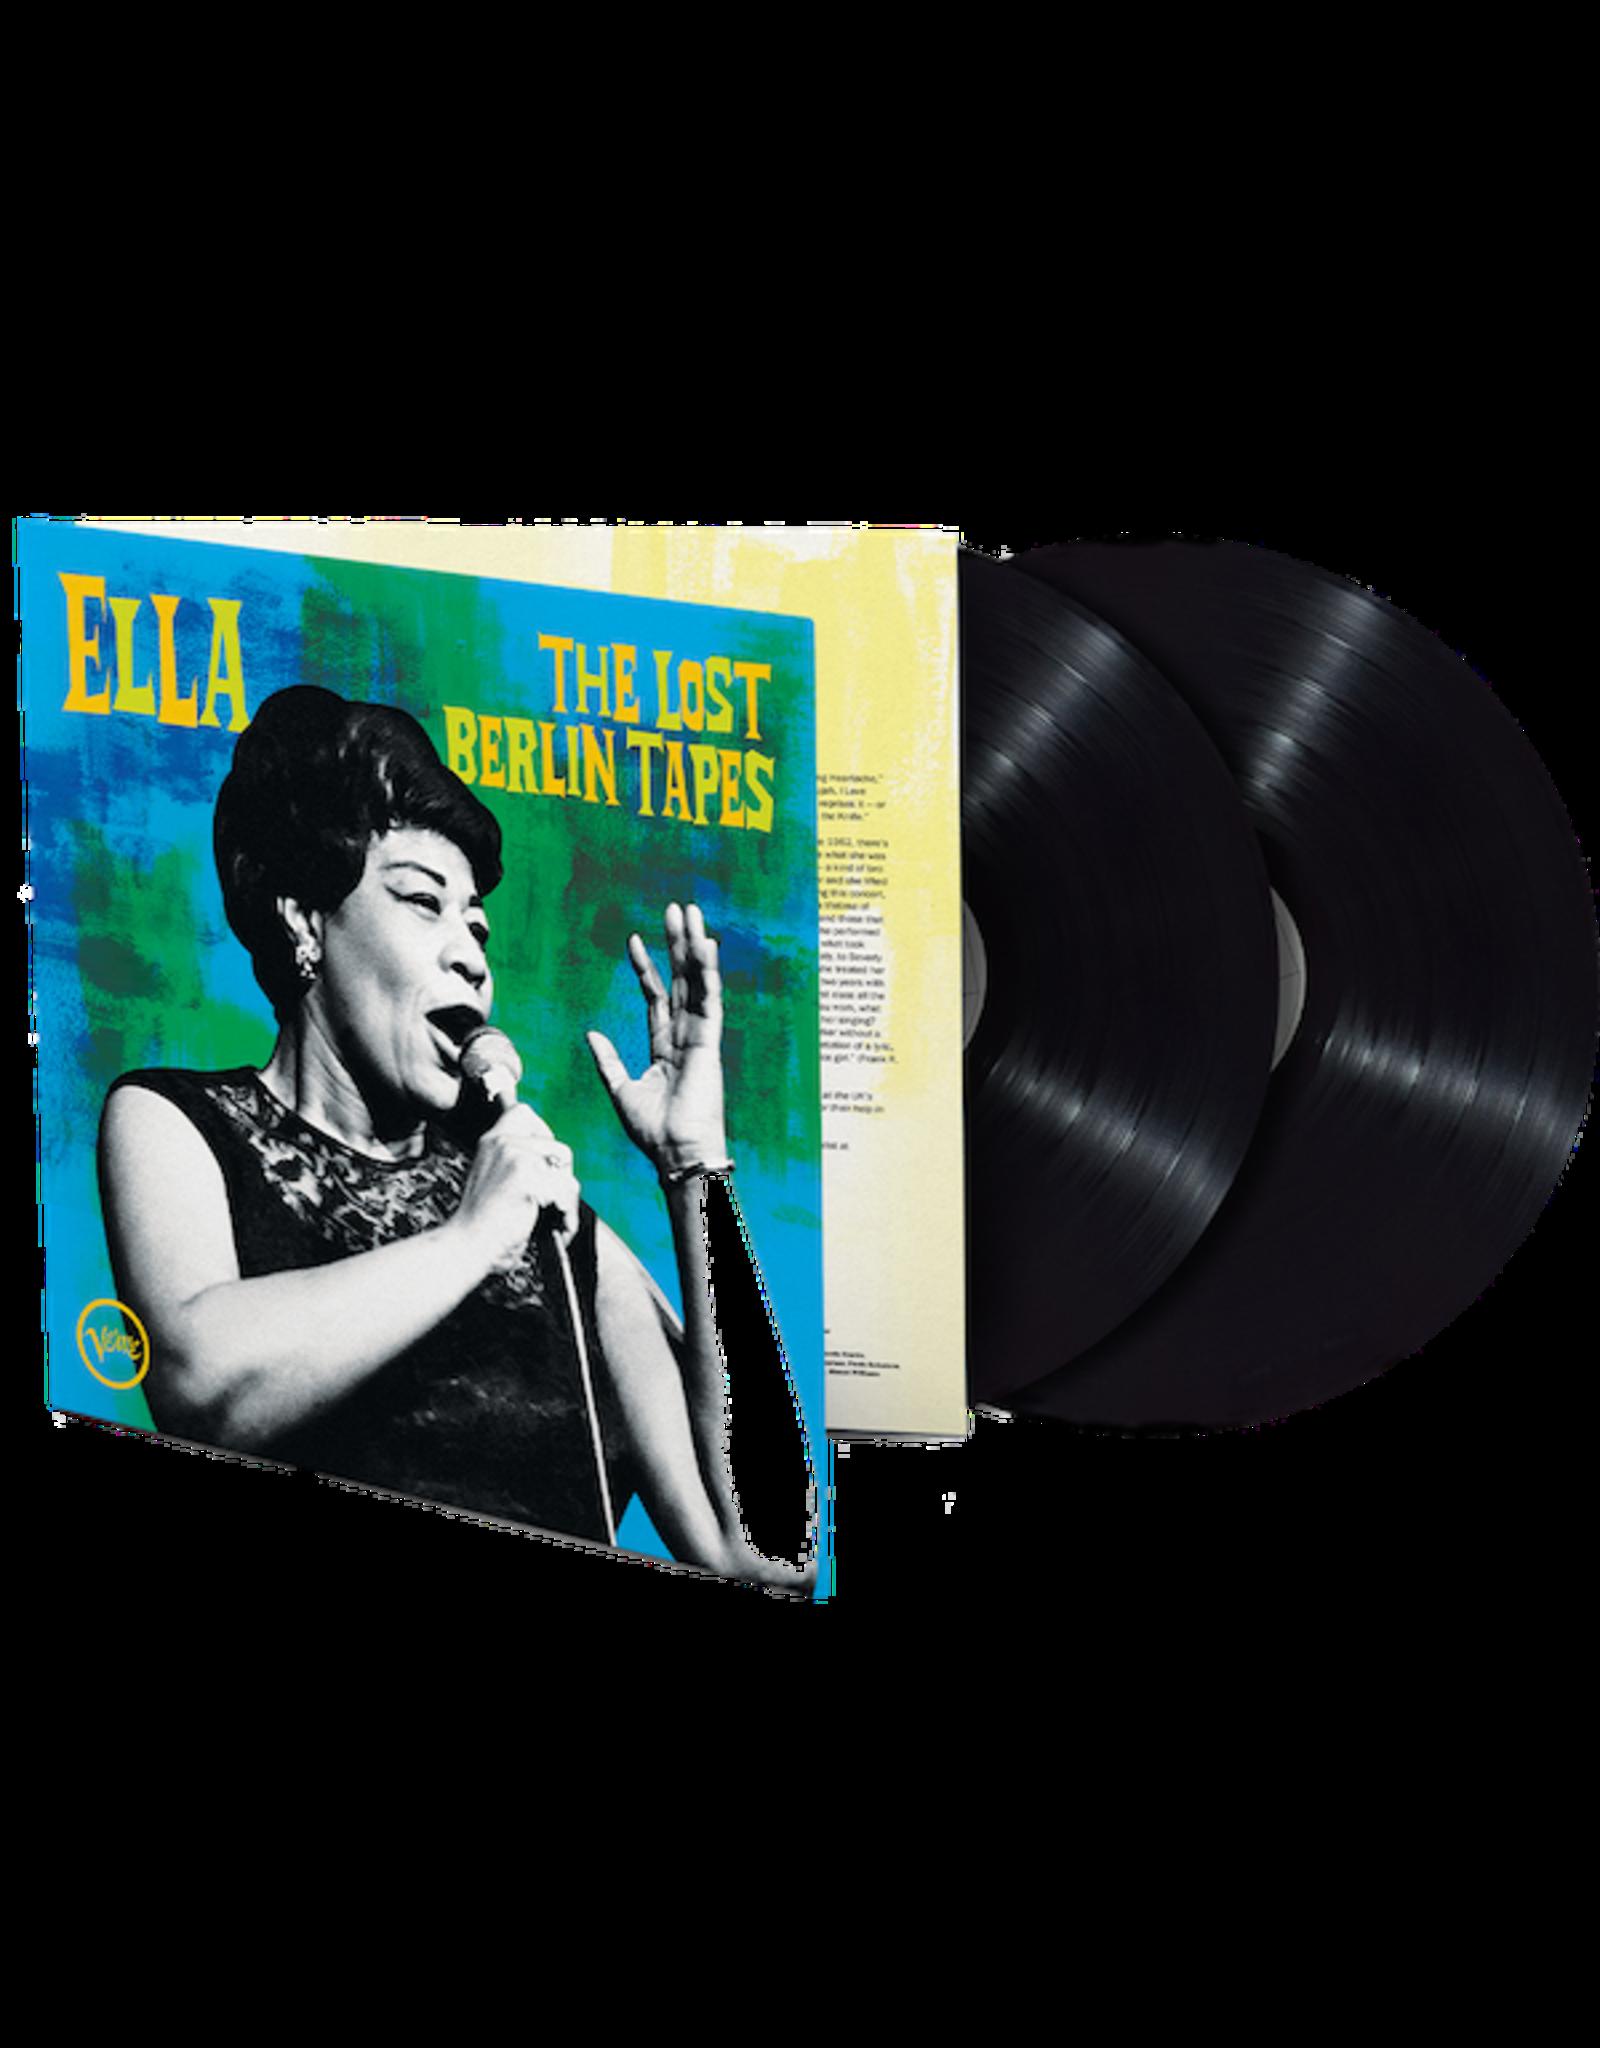 Ella Fitzgerald - The Lost Berlin Tapes (Live 1962)